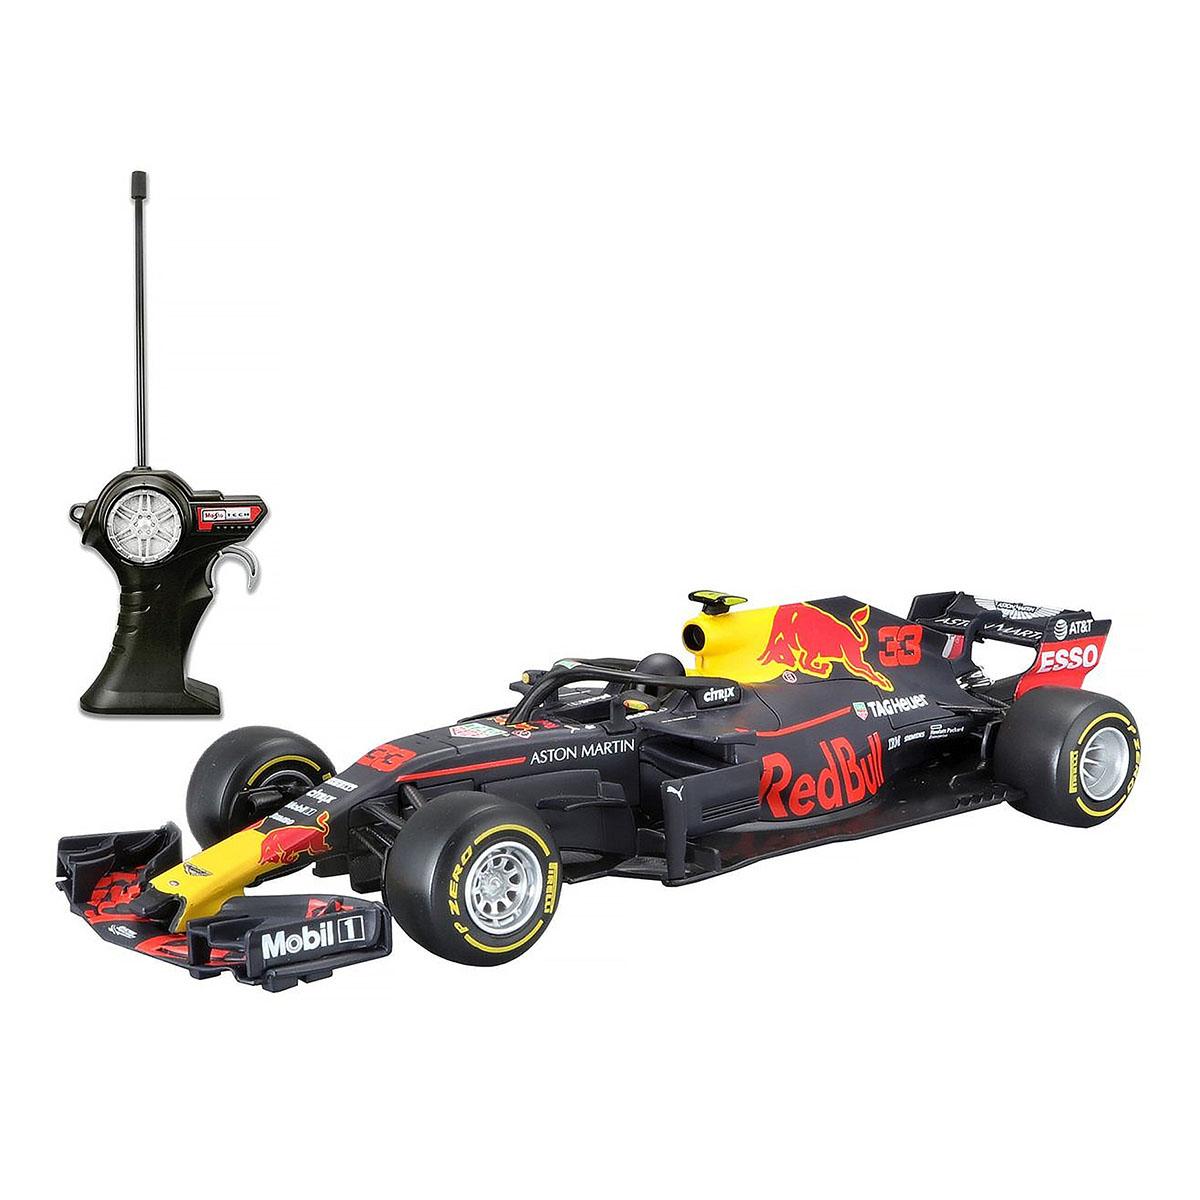 Masinuta cu telecomanda Maisto Aston Martin RB14 Max Verstappen, 1:24, 40 MHz